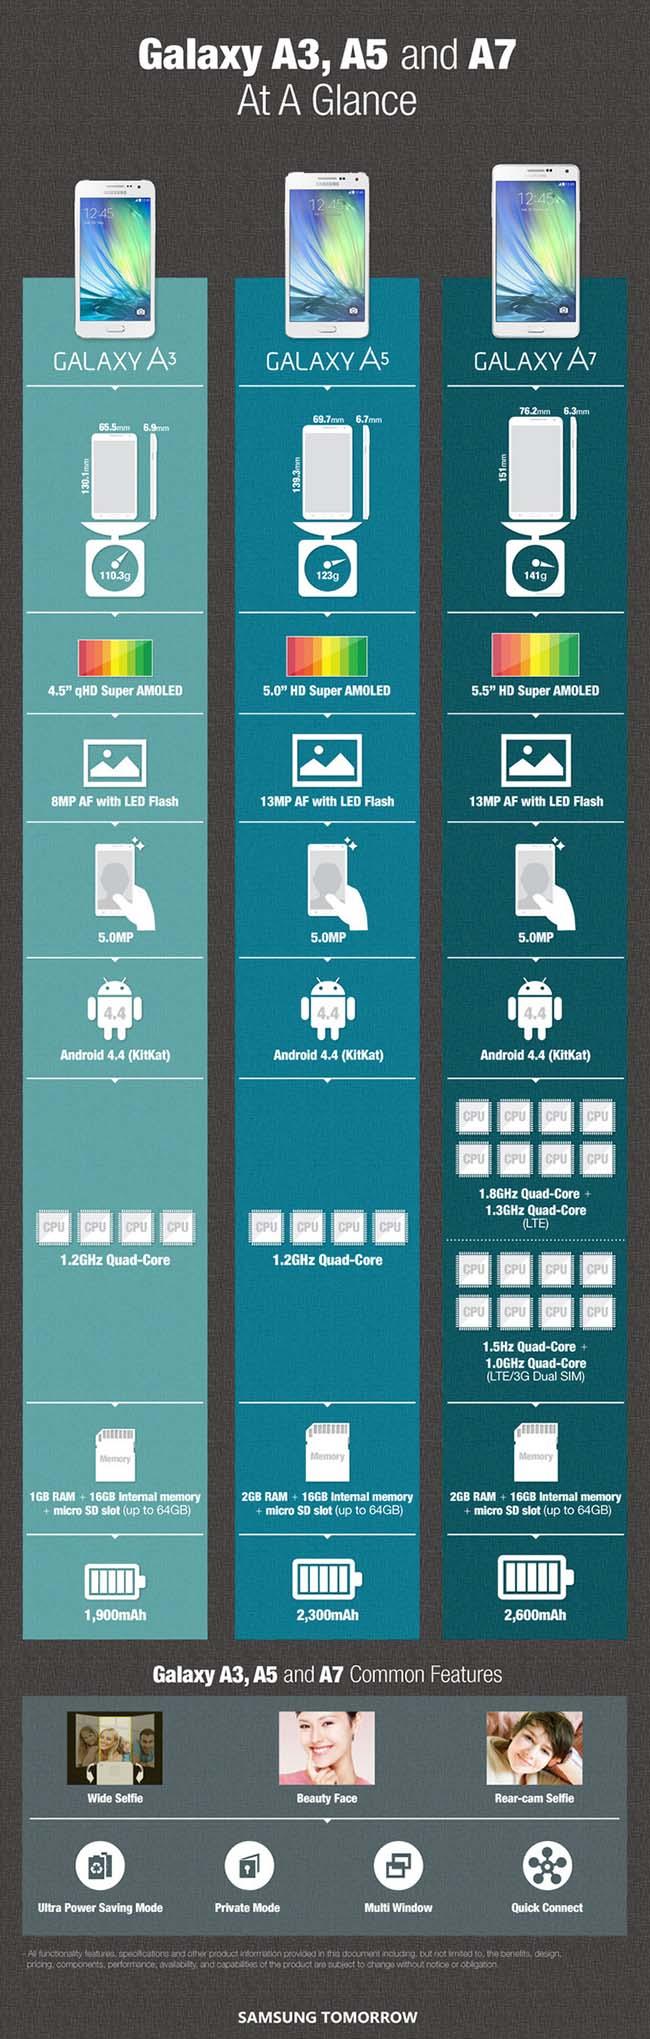 Samsung-Galaxy-A7-infographic